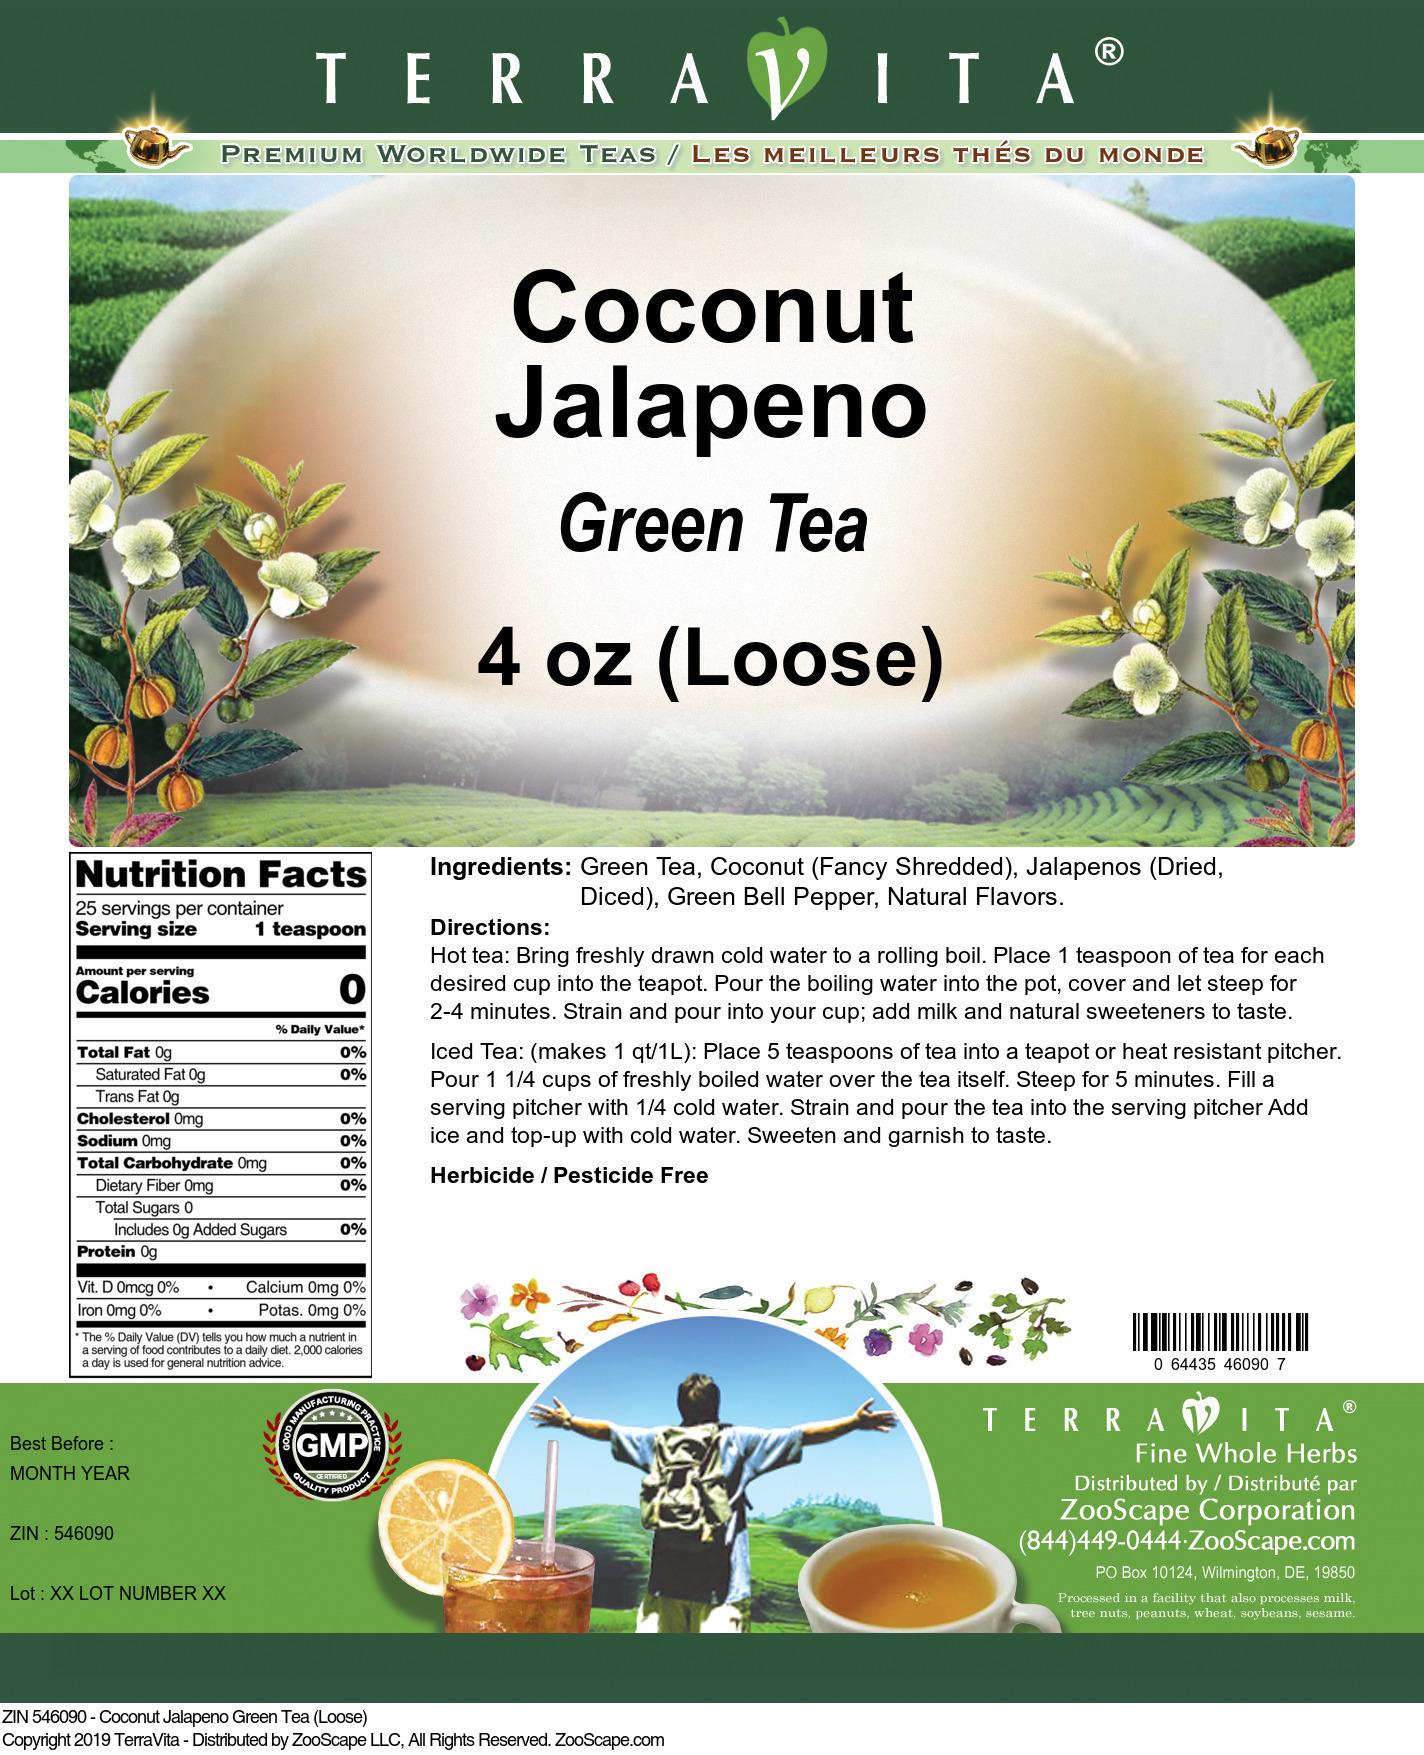 Coconut Jalapeno Green Tea (Loose)